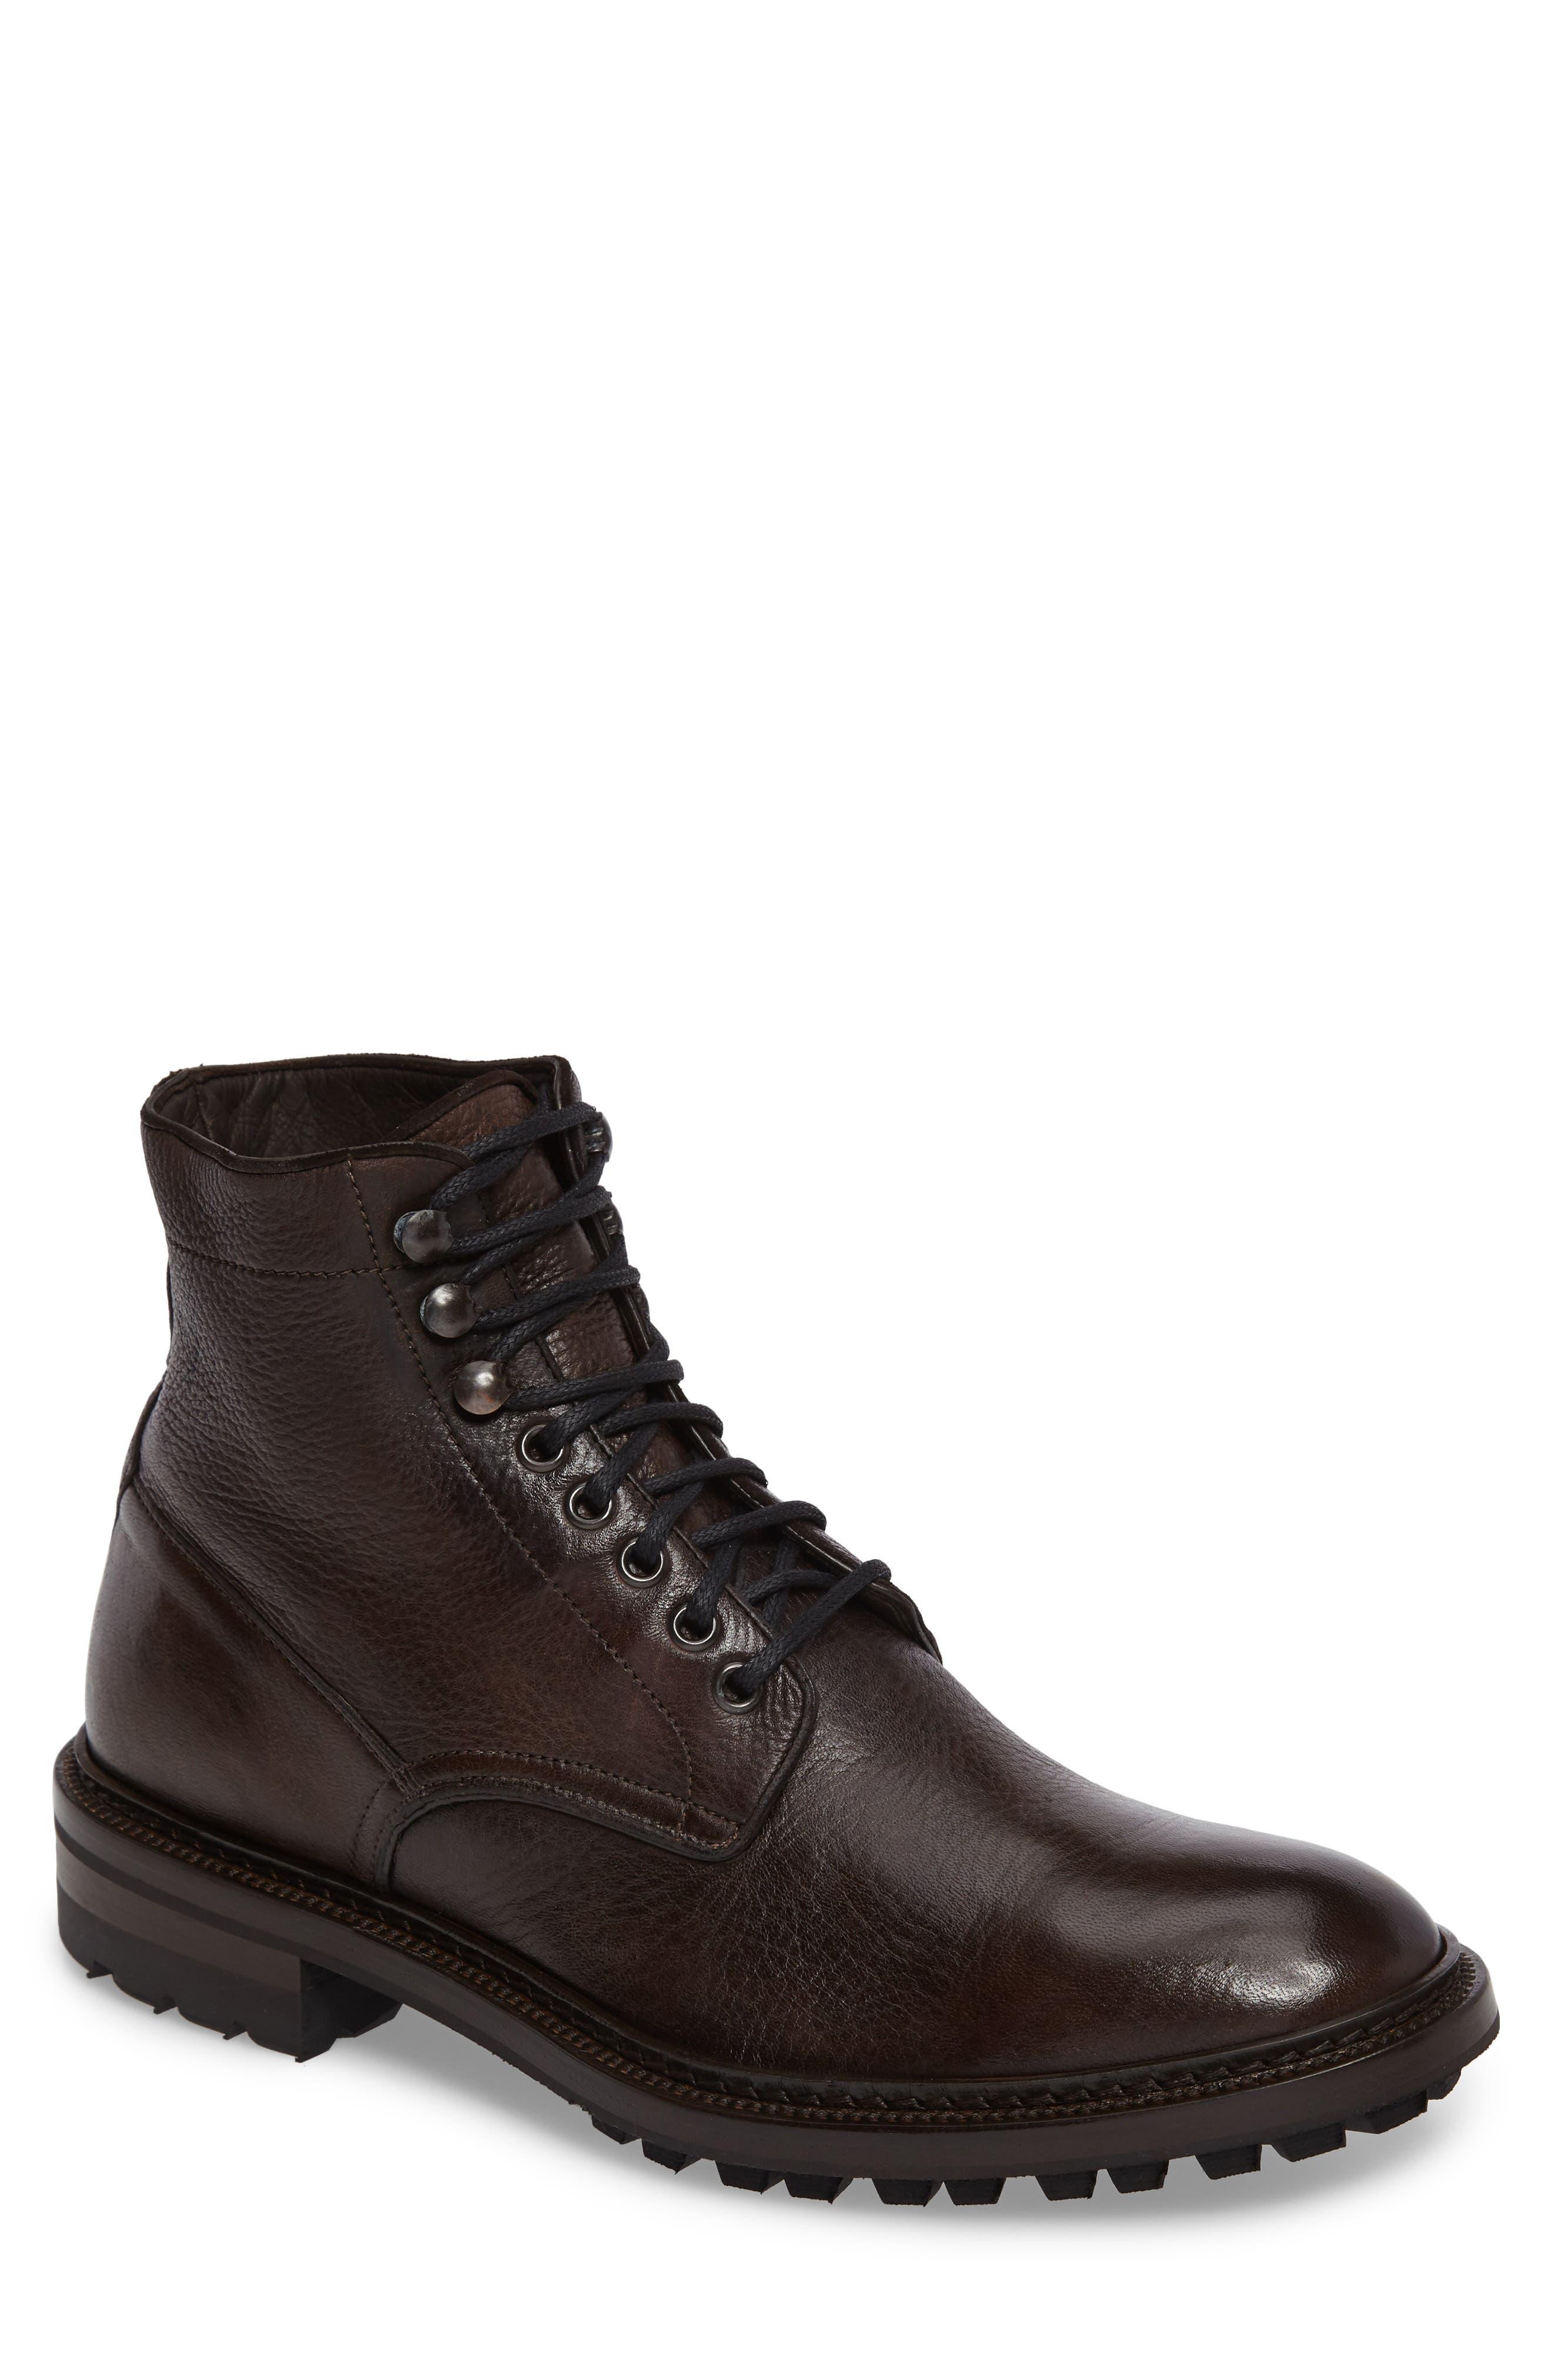 Greyson Plain Toe Boot,                         Main,                         color, 200